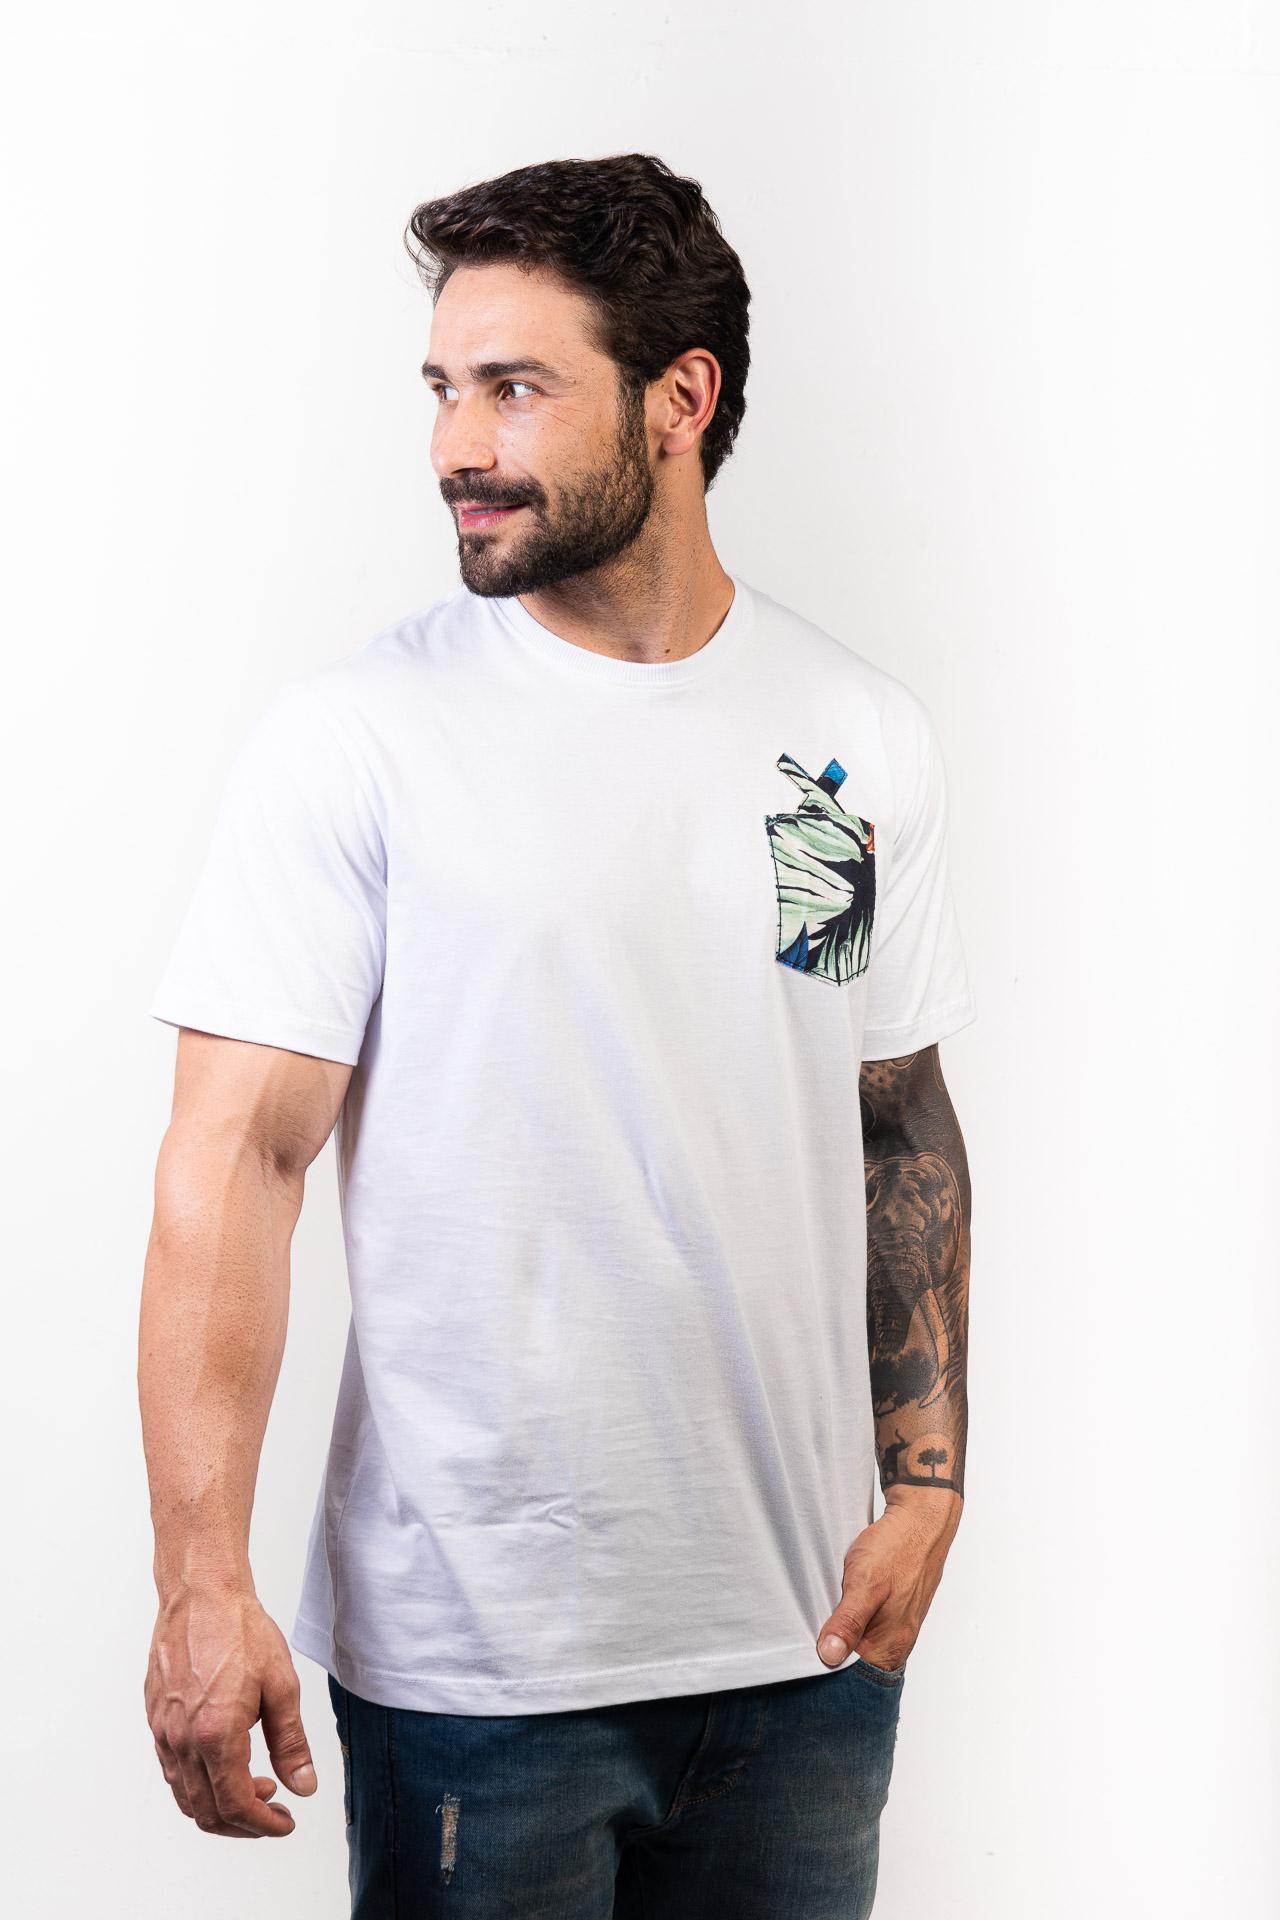 Camiseta Masculina TXC 2047